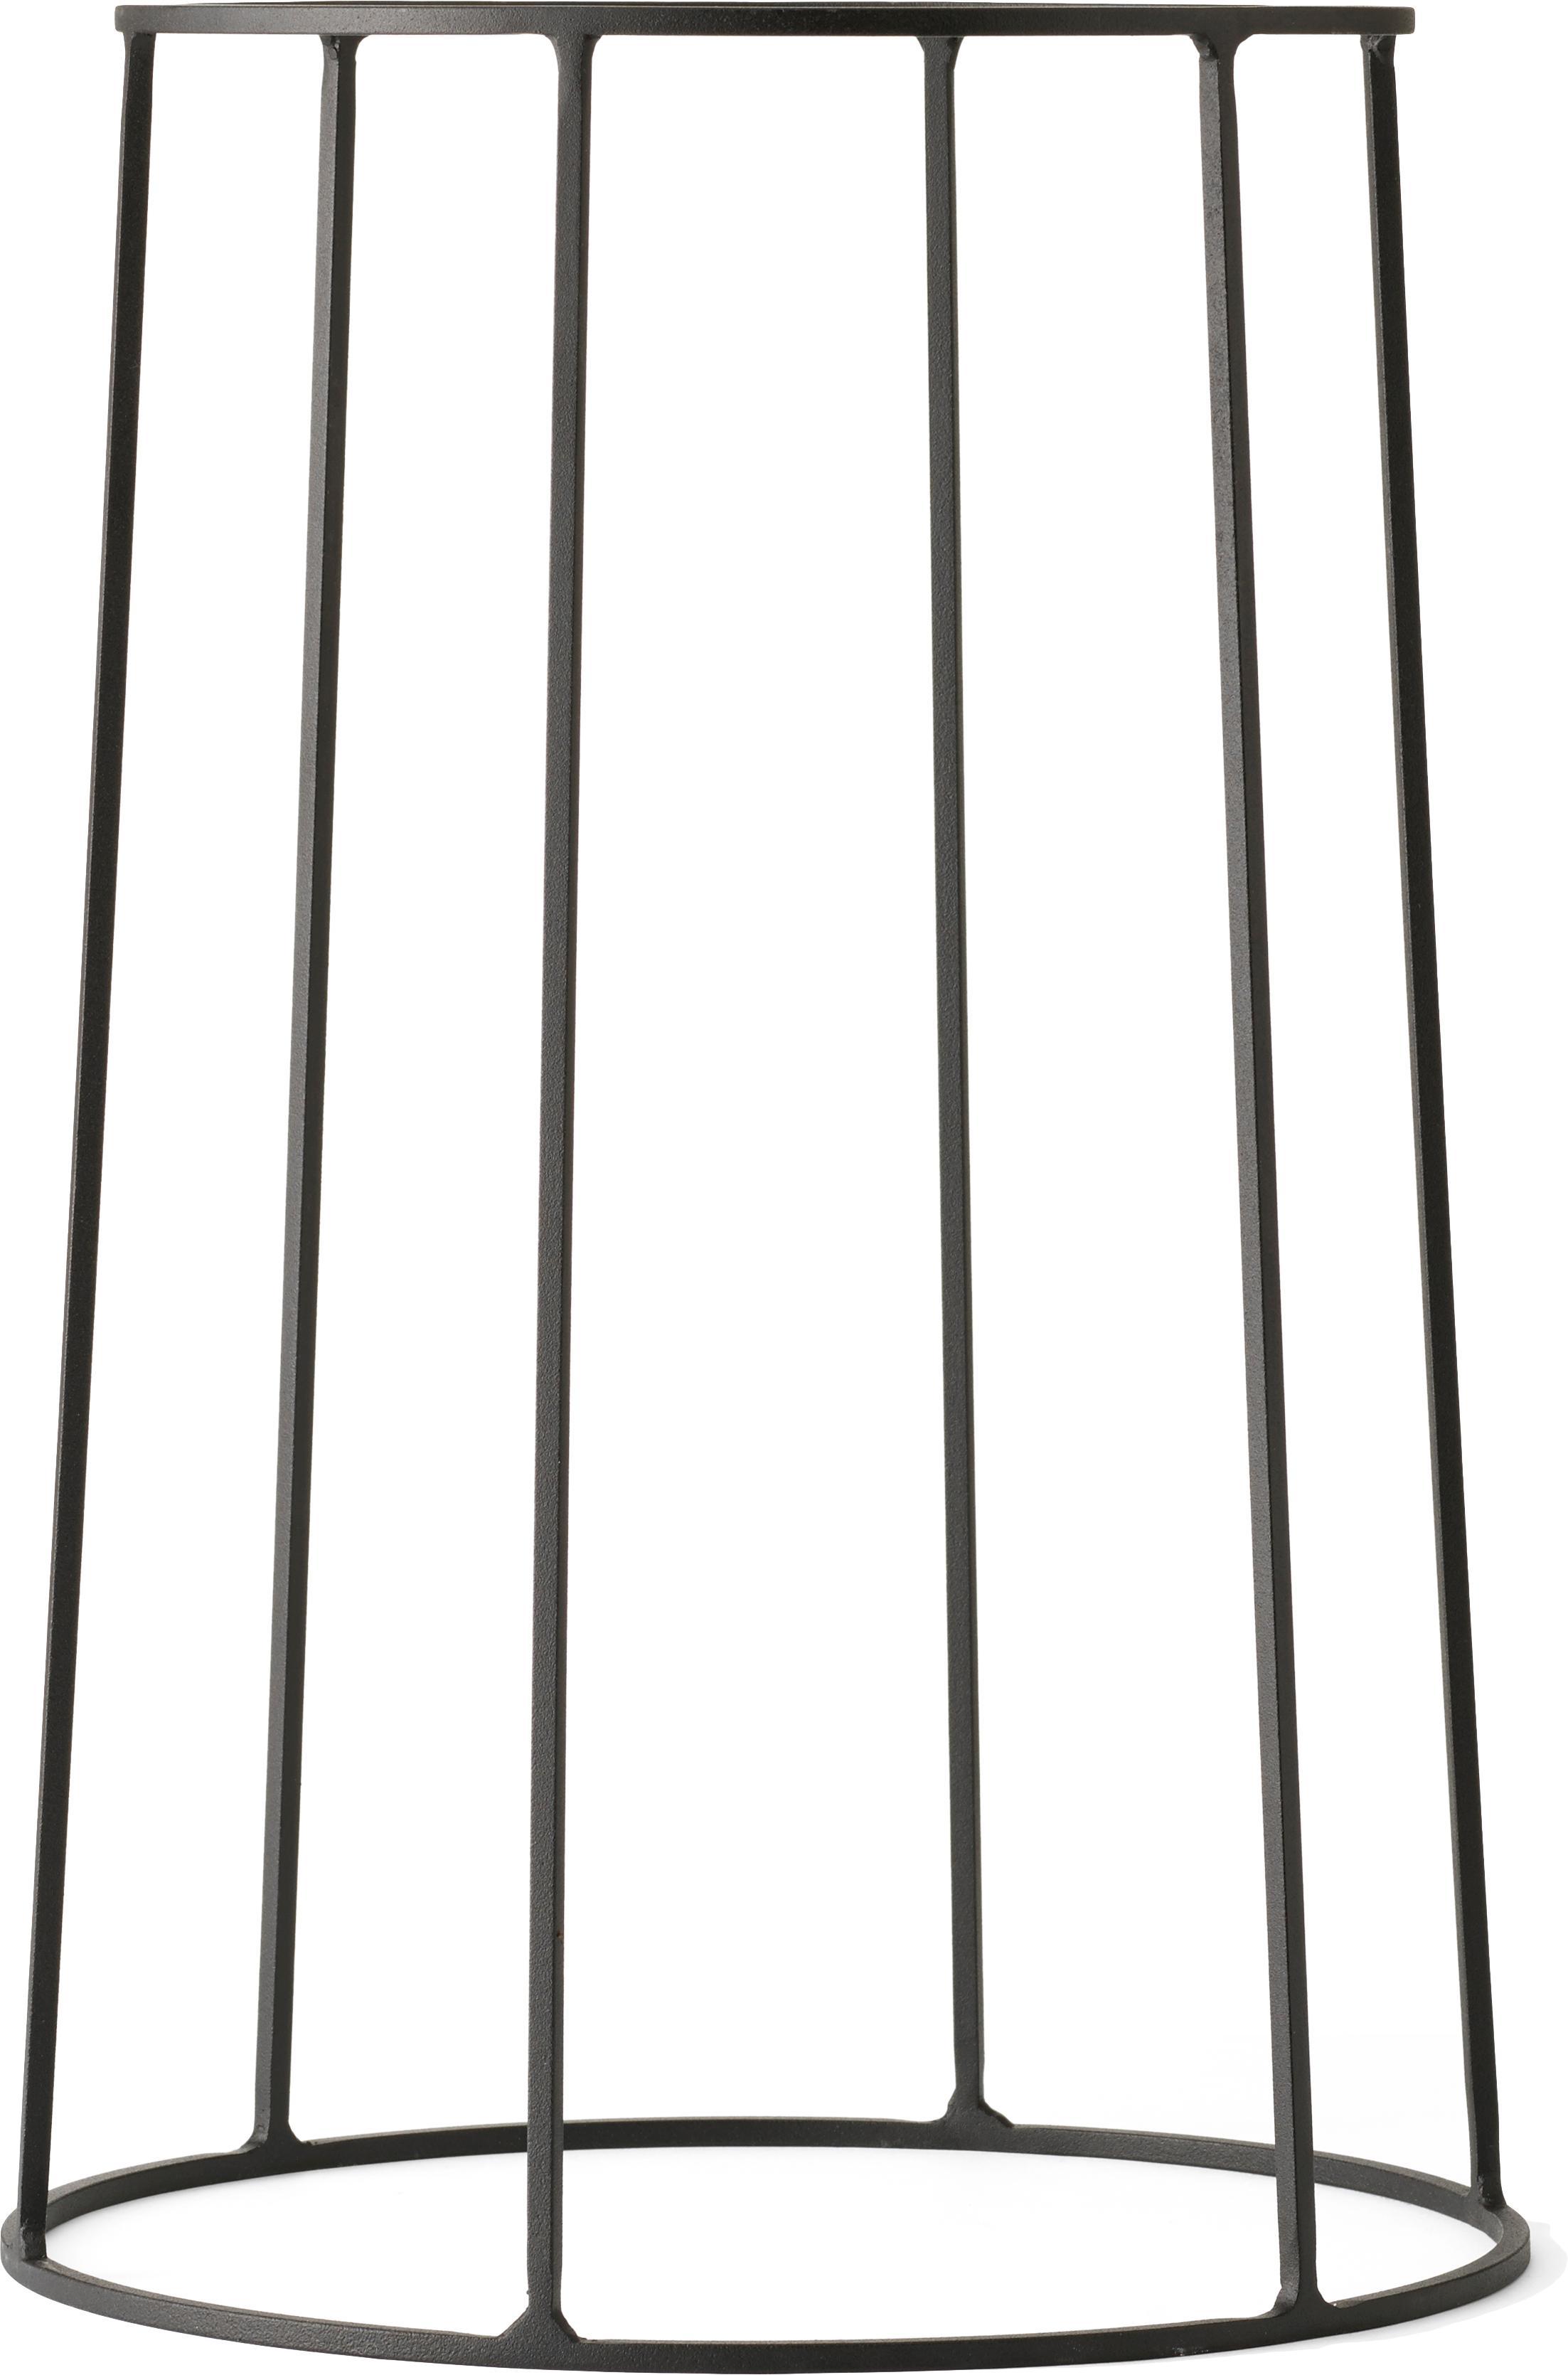 Plantenpot standaard Wire Base, Staal, poedergecoat, Zwart, Ø 23 x H 40 cm